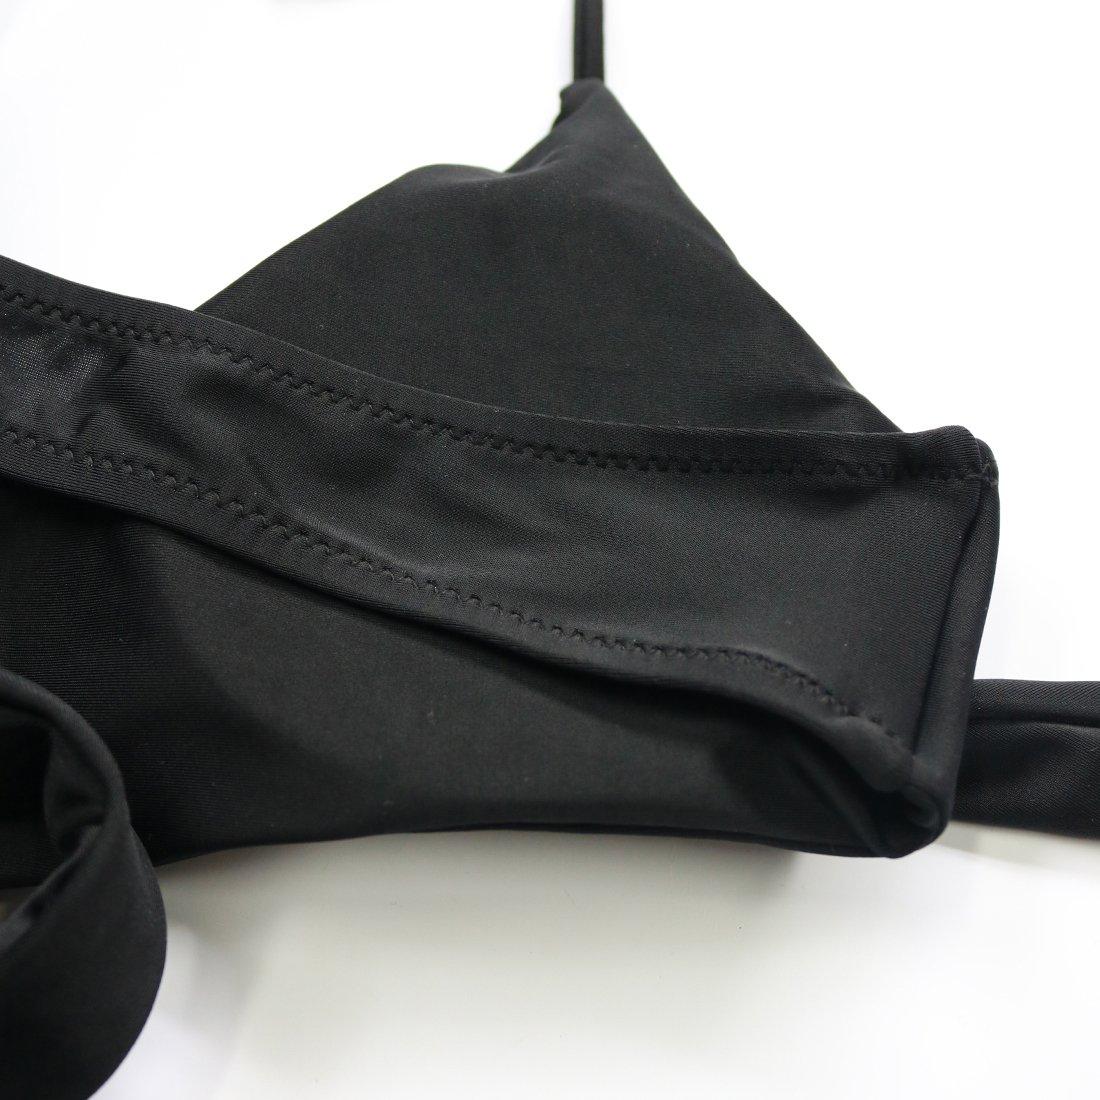 MOOSKINI Womens Padded Push-up Bikini Set Bathing Suits Two Pieces Swimsuit Black